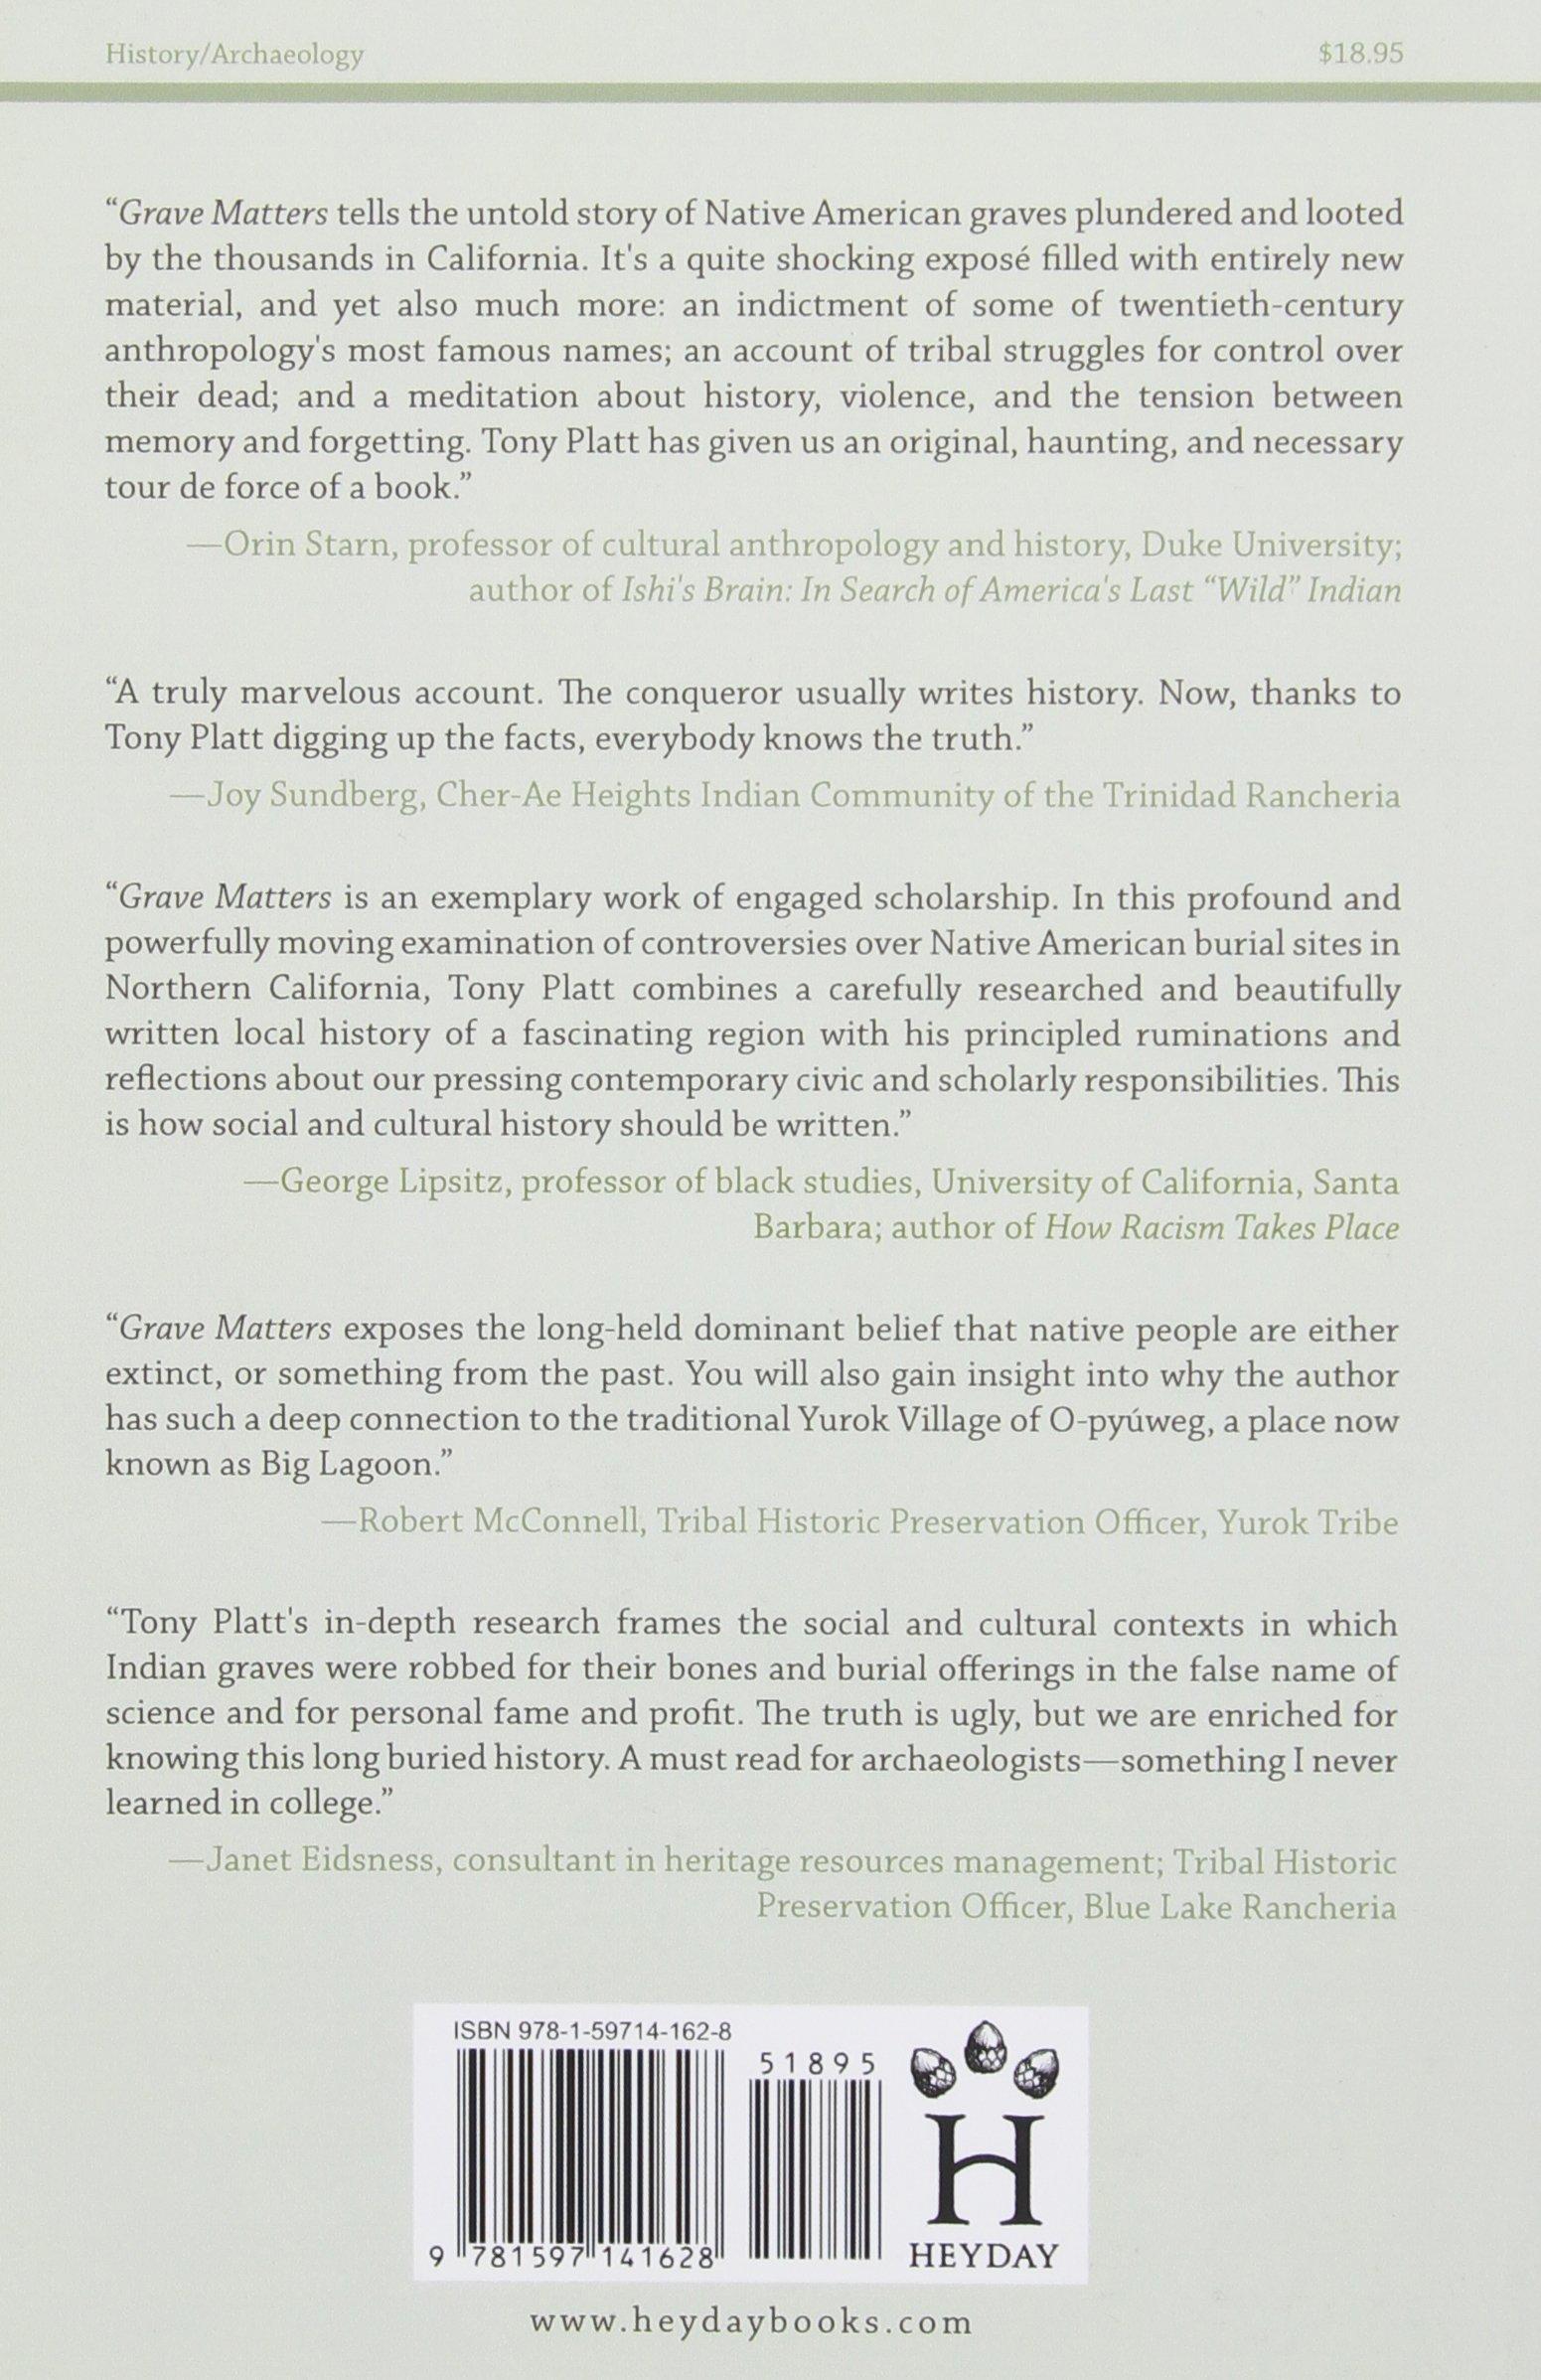 Grave Matters: Excavating California's Buried Past: Tony Platt:  9781597141628: Amazon.com: Books